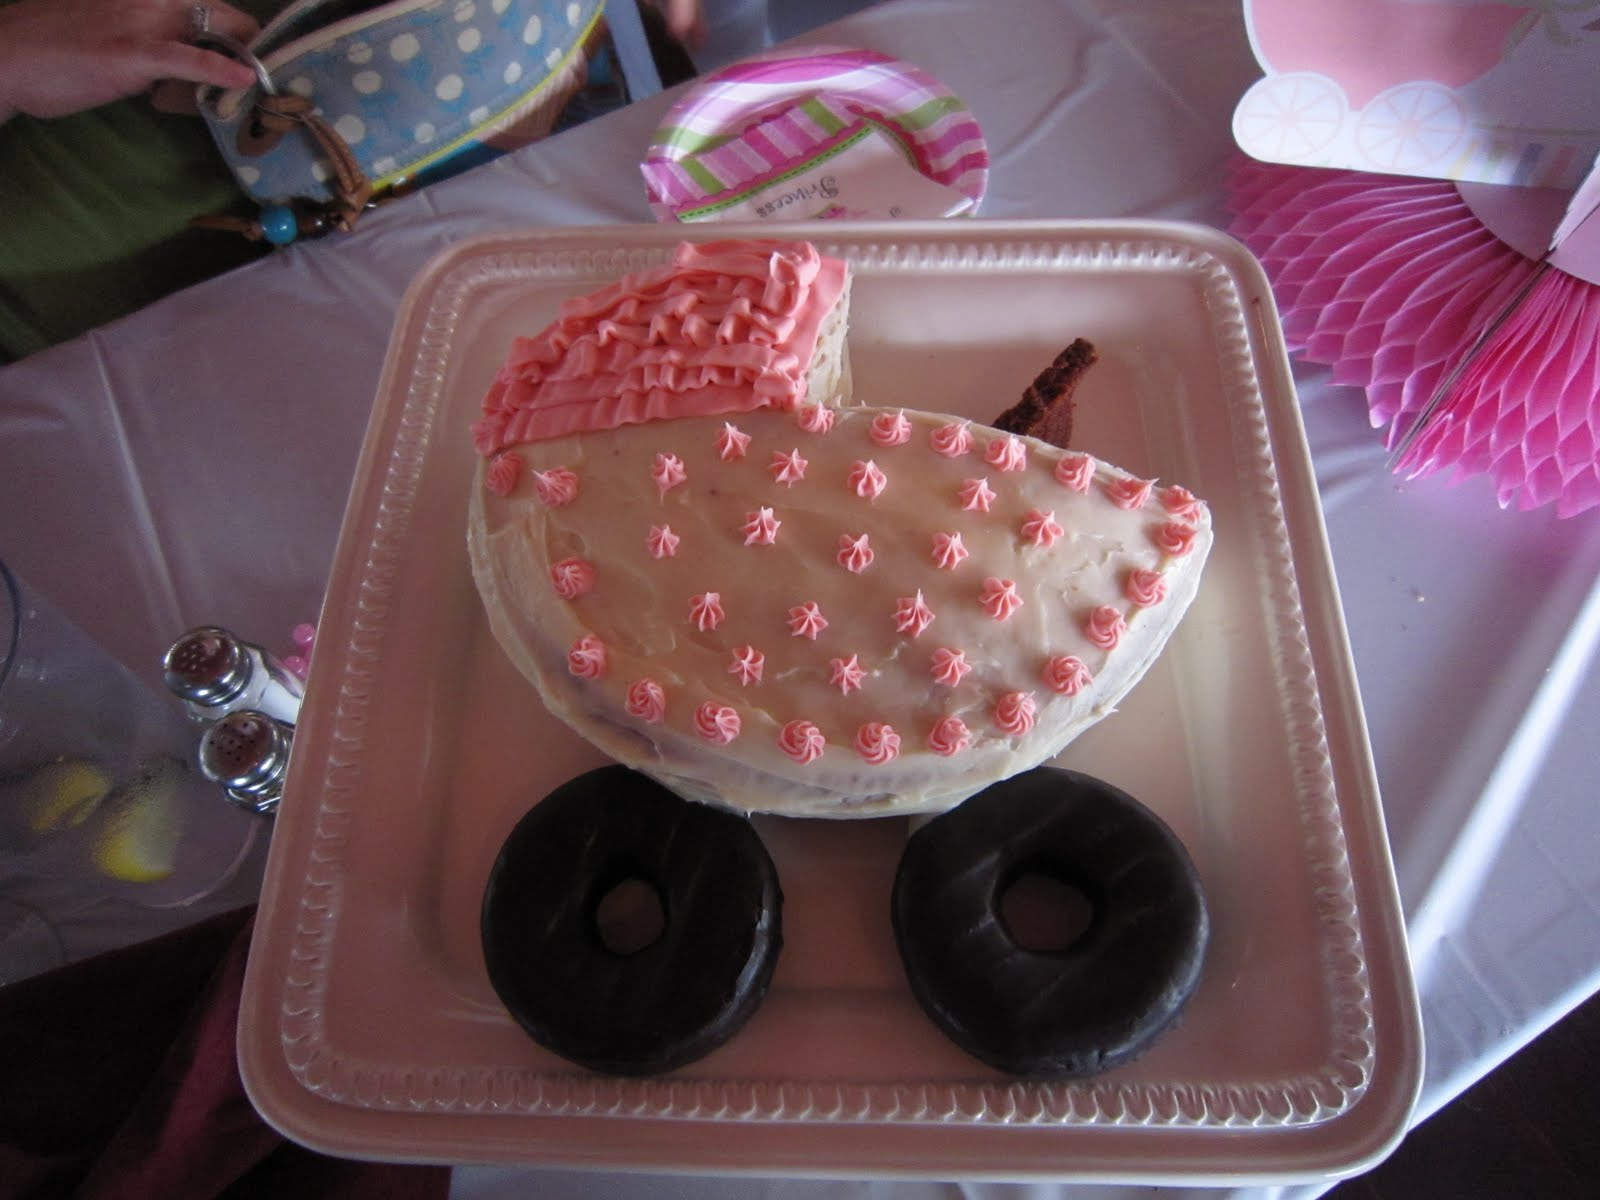 king soopers cake catalog 2015